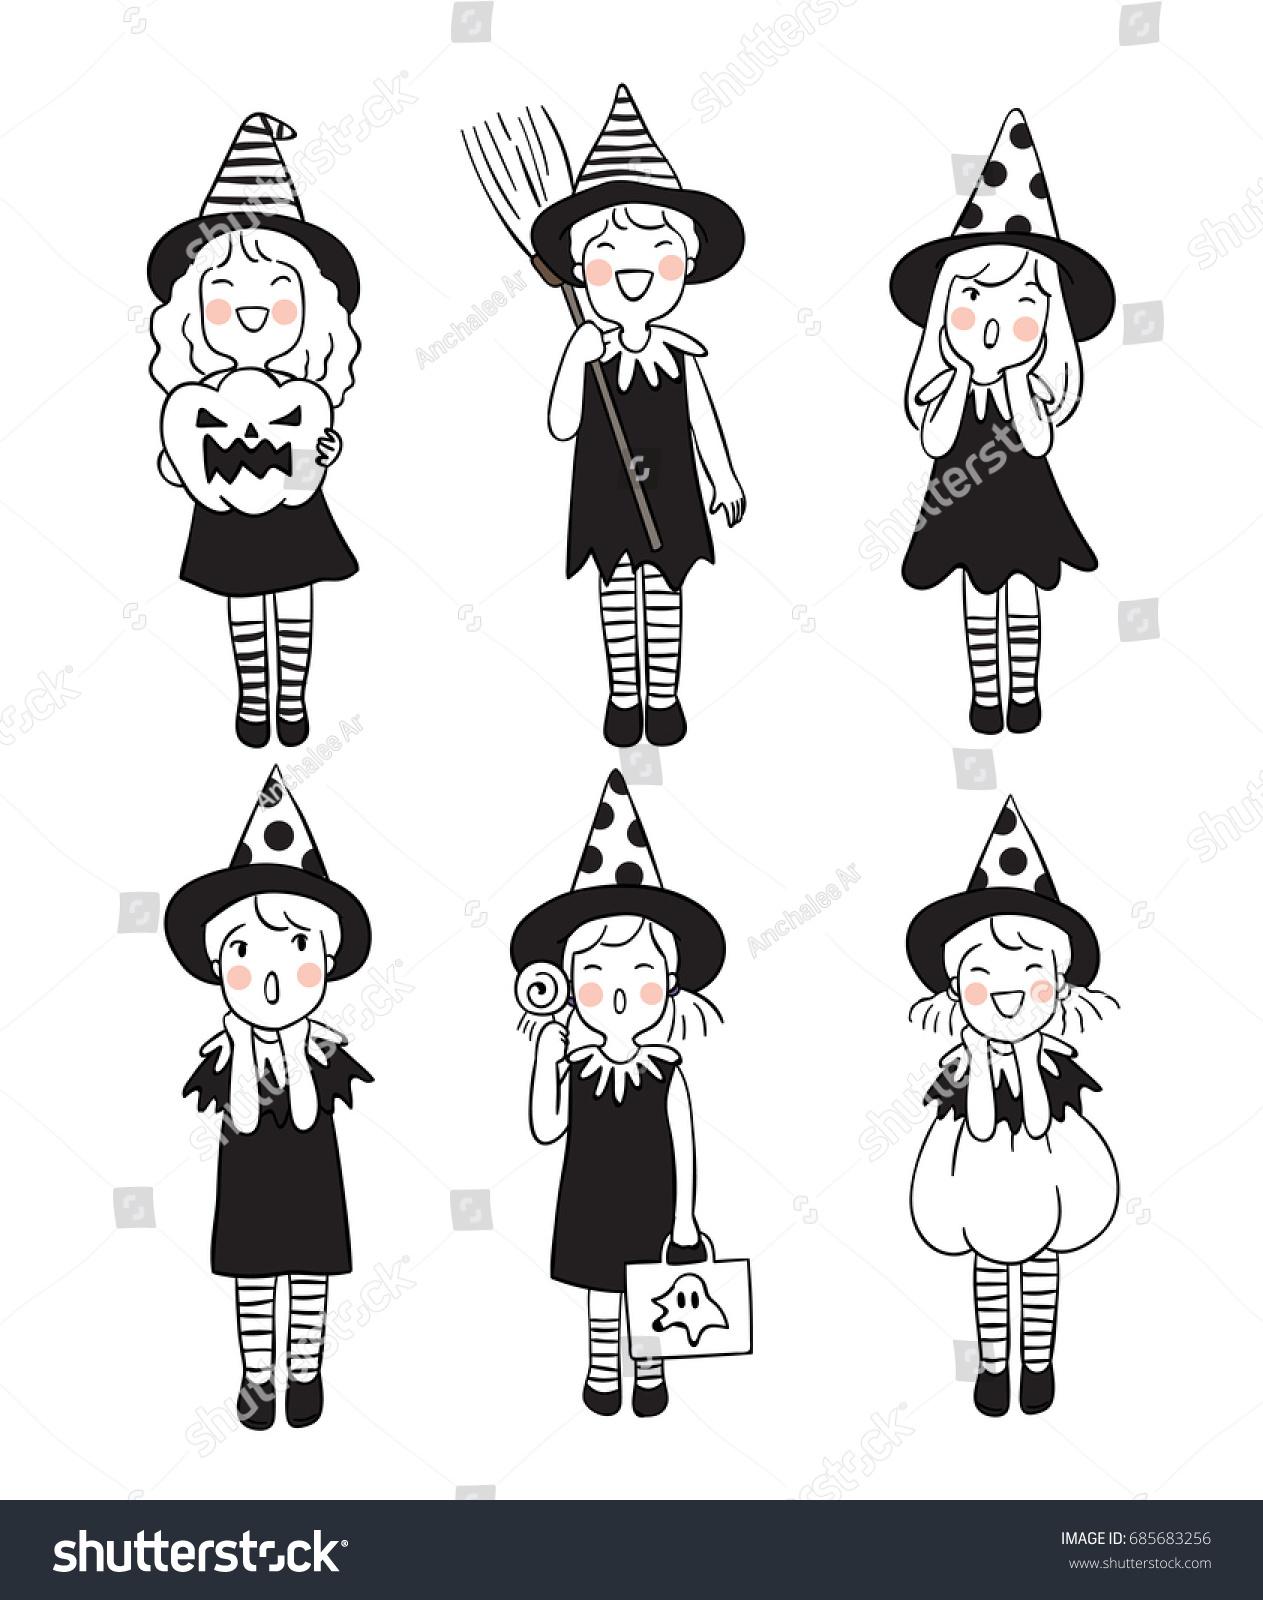 Vector Illustration Character Design Cute Girl Stock Vector Royalty